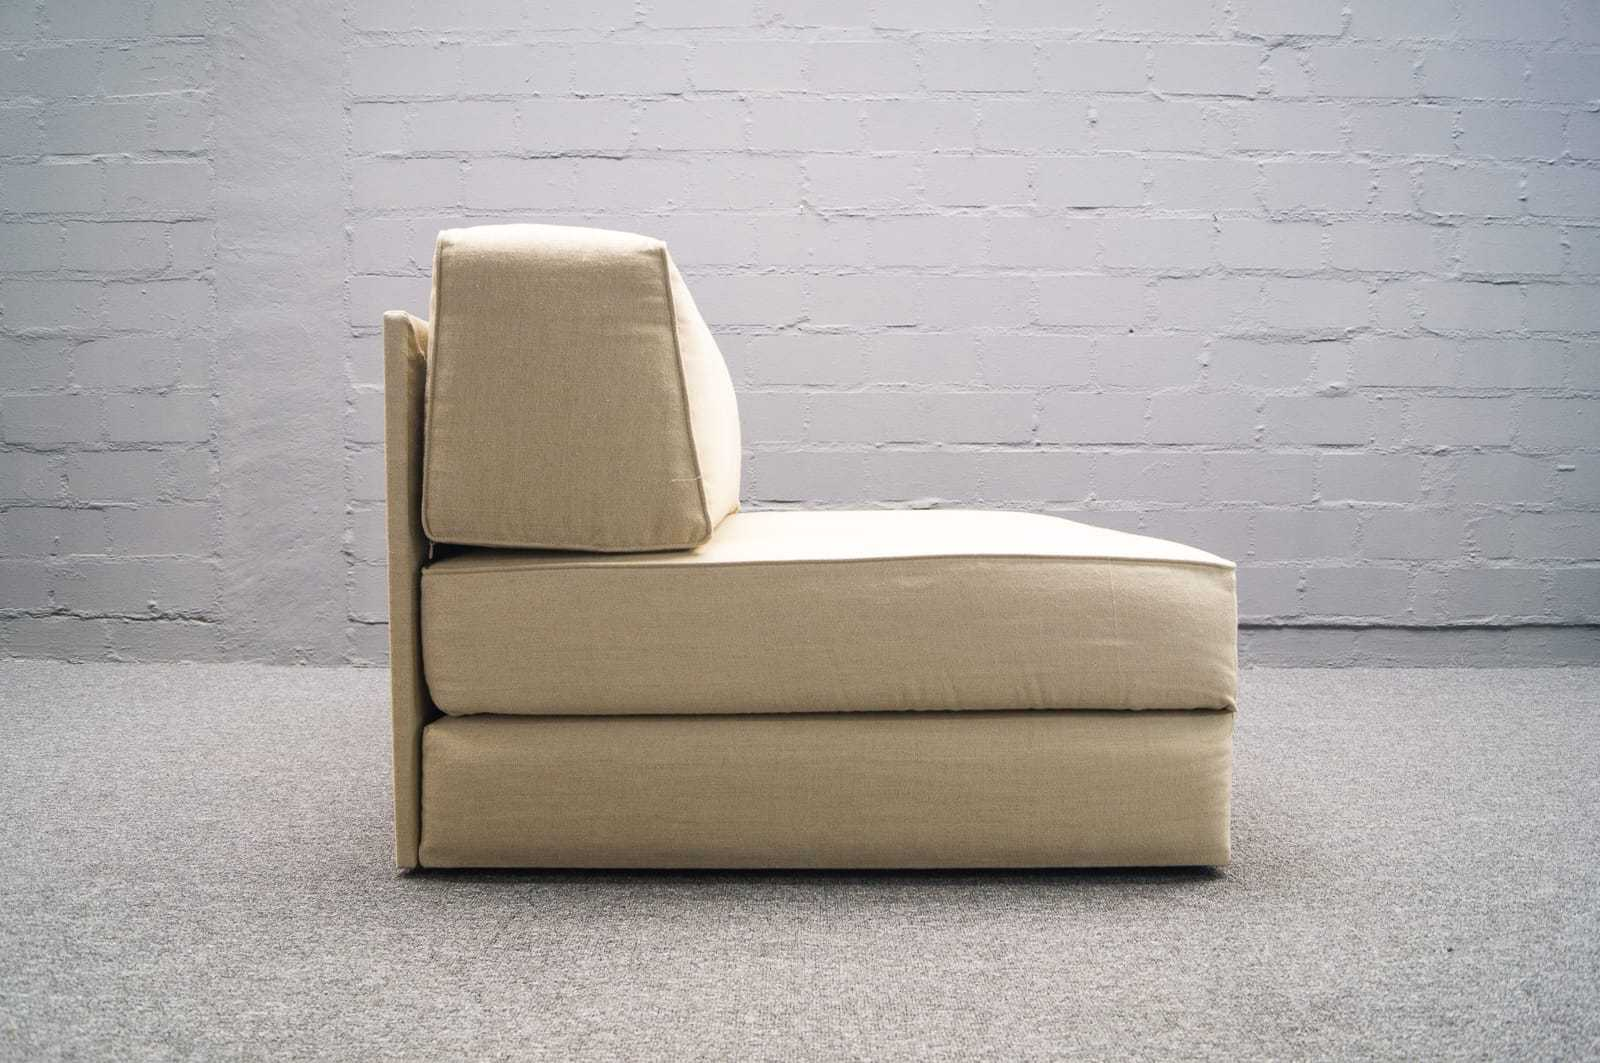 wohnform sessel daybed ausklappbar lounge chair 60er 70er g stebett bett 1v 2 ebay. Black Bedroom Furniture Sets. Home Design Ideas